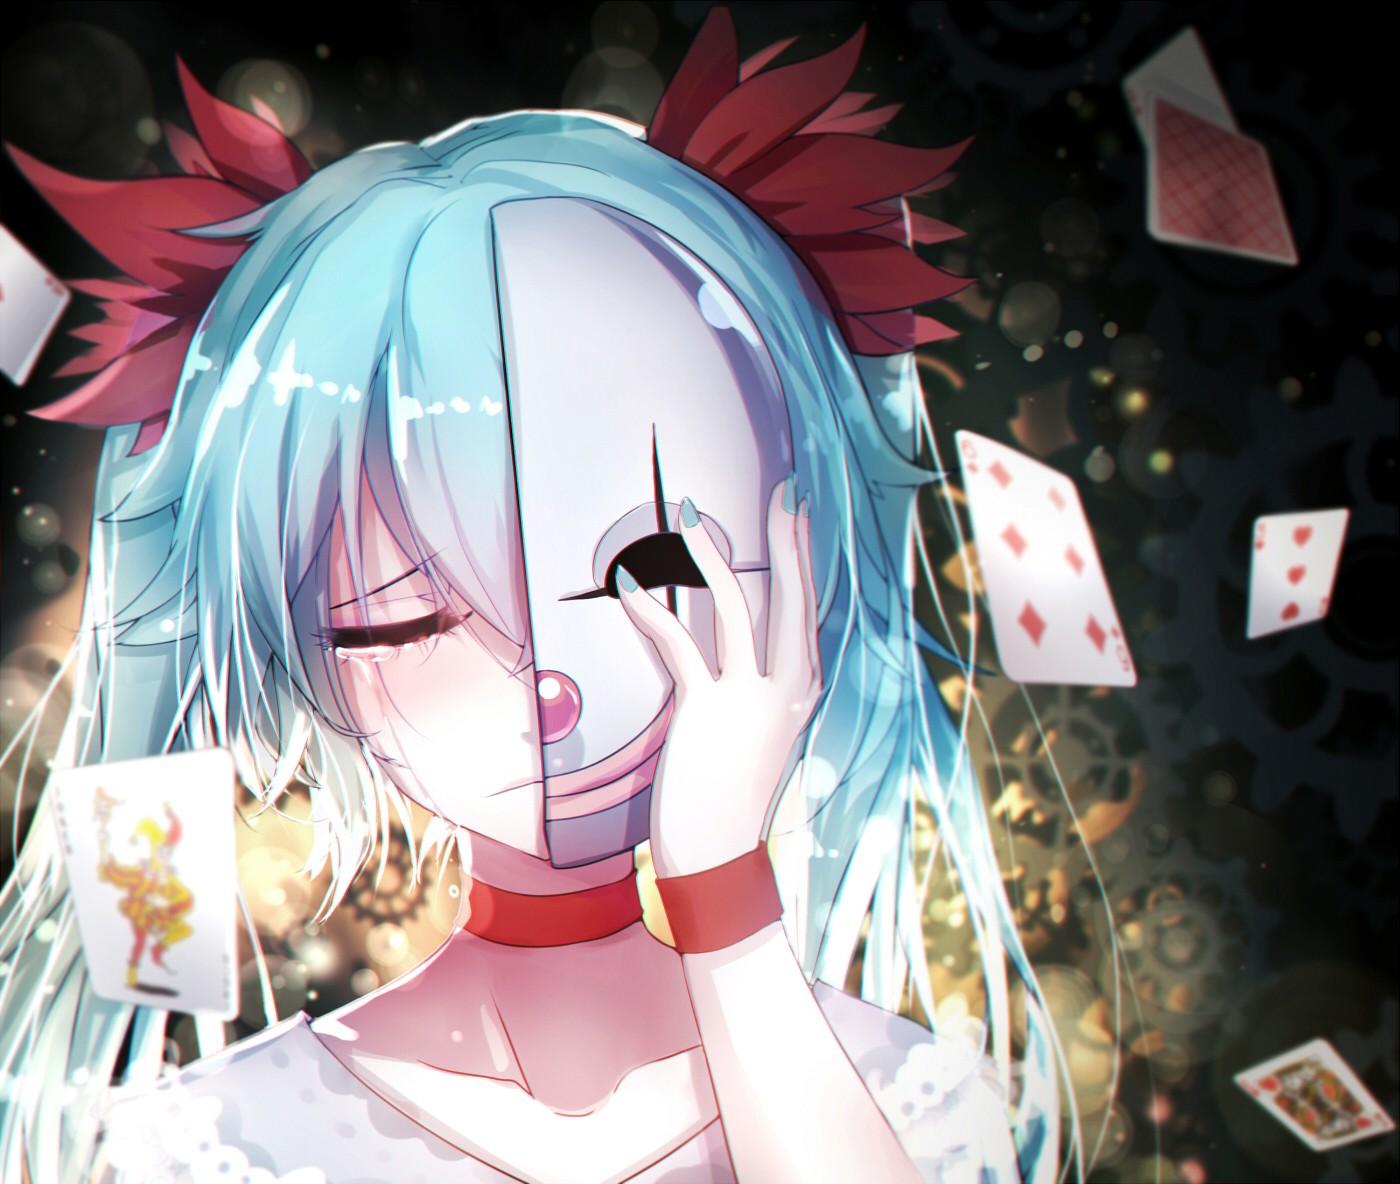 Wallpaper : anime girls, mask, Vocaloid, Hatsune Miku, tears